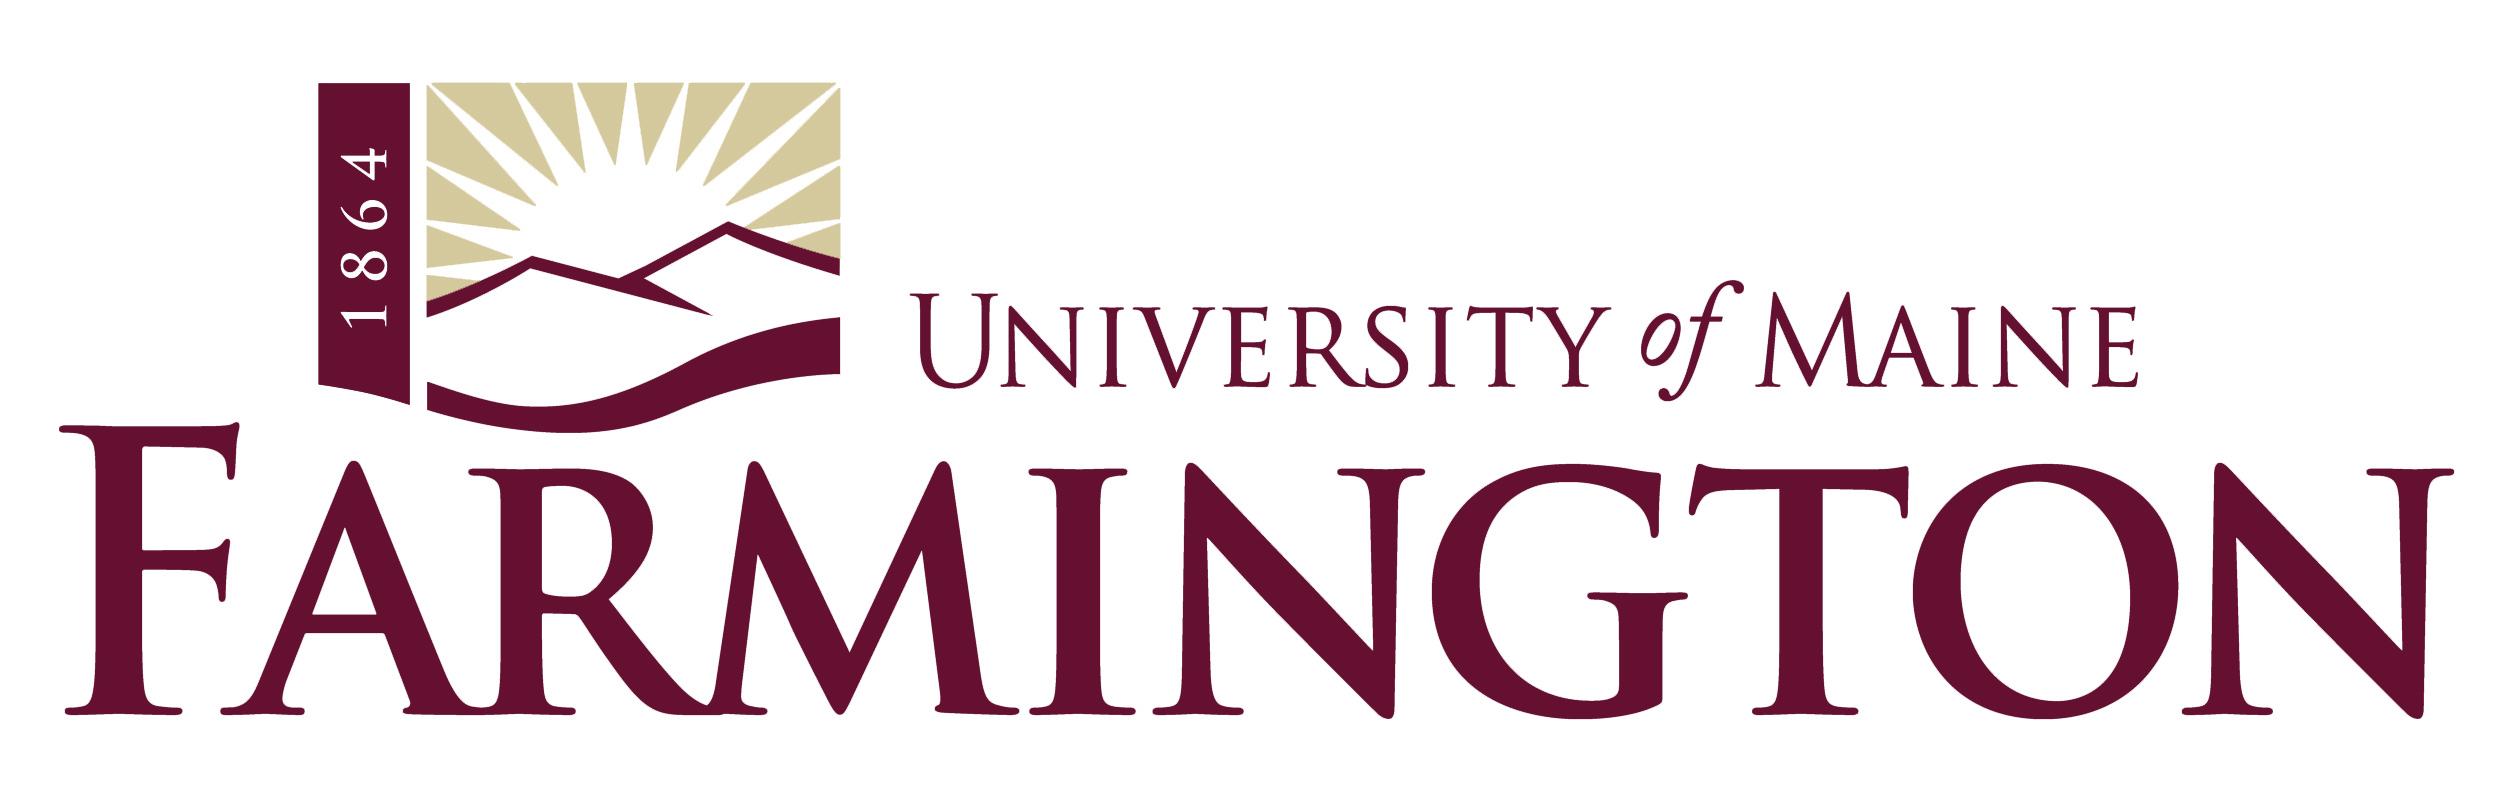 University of Maine Farmington